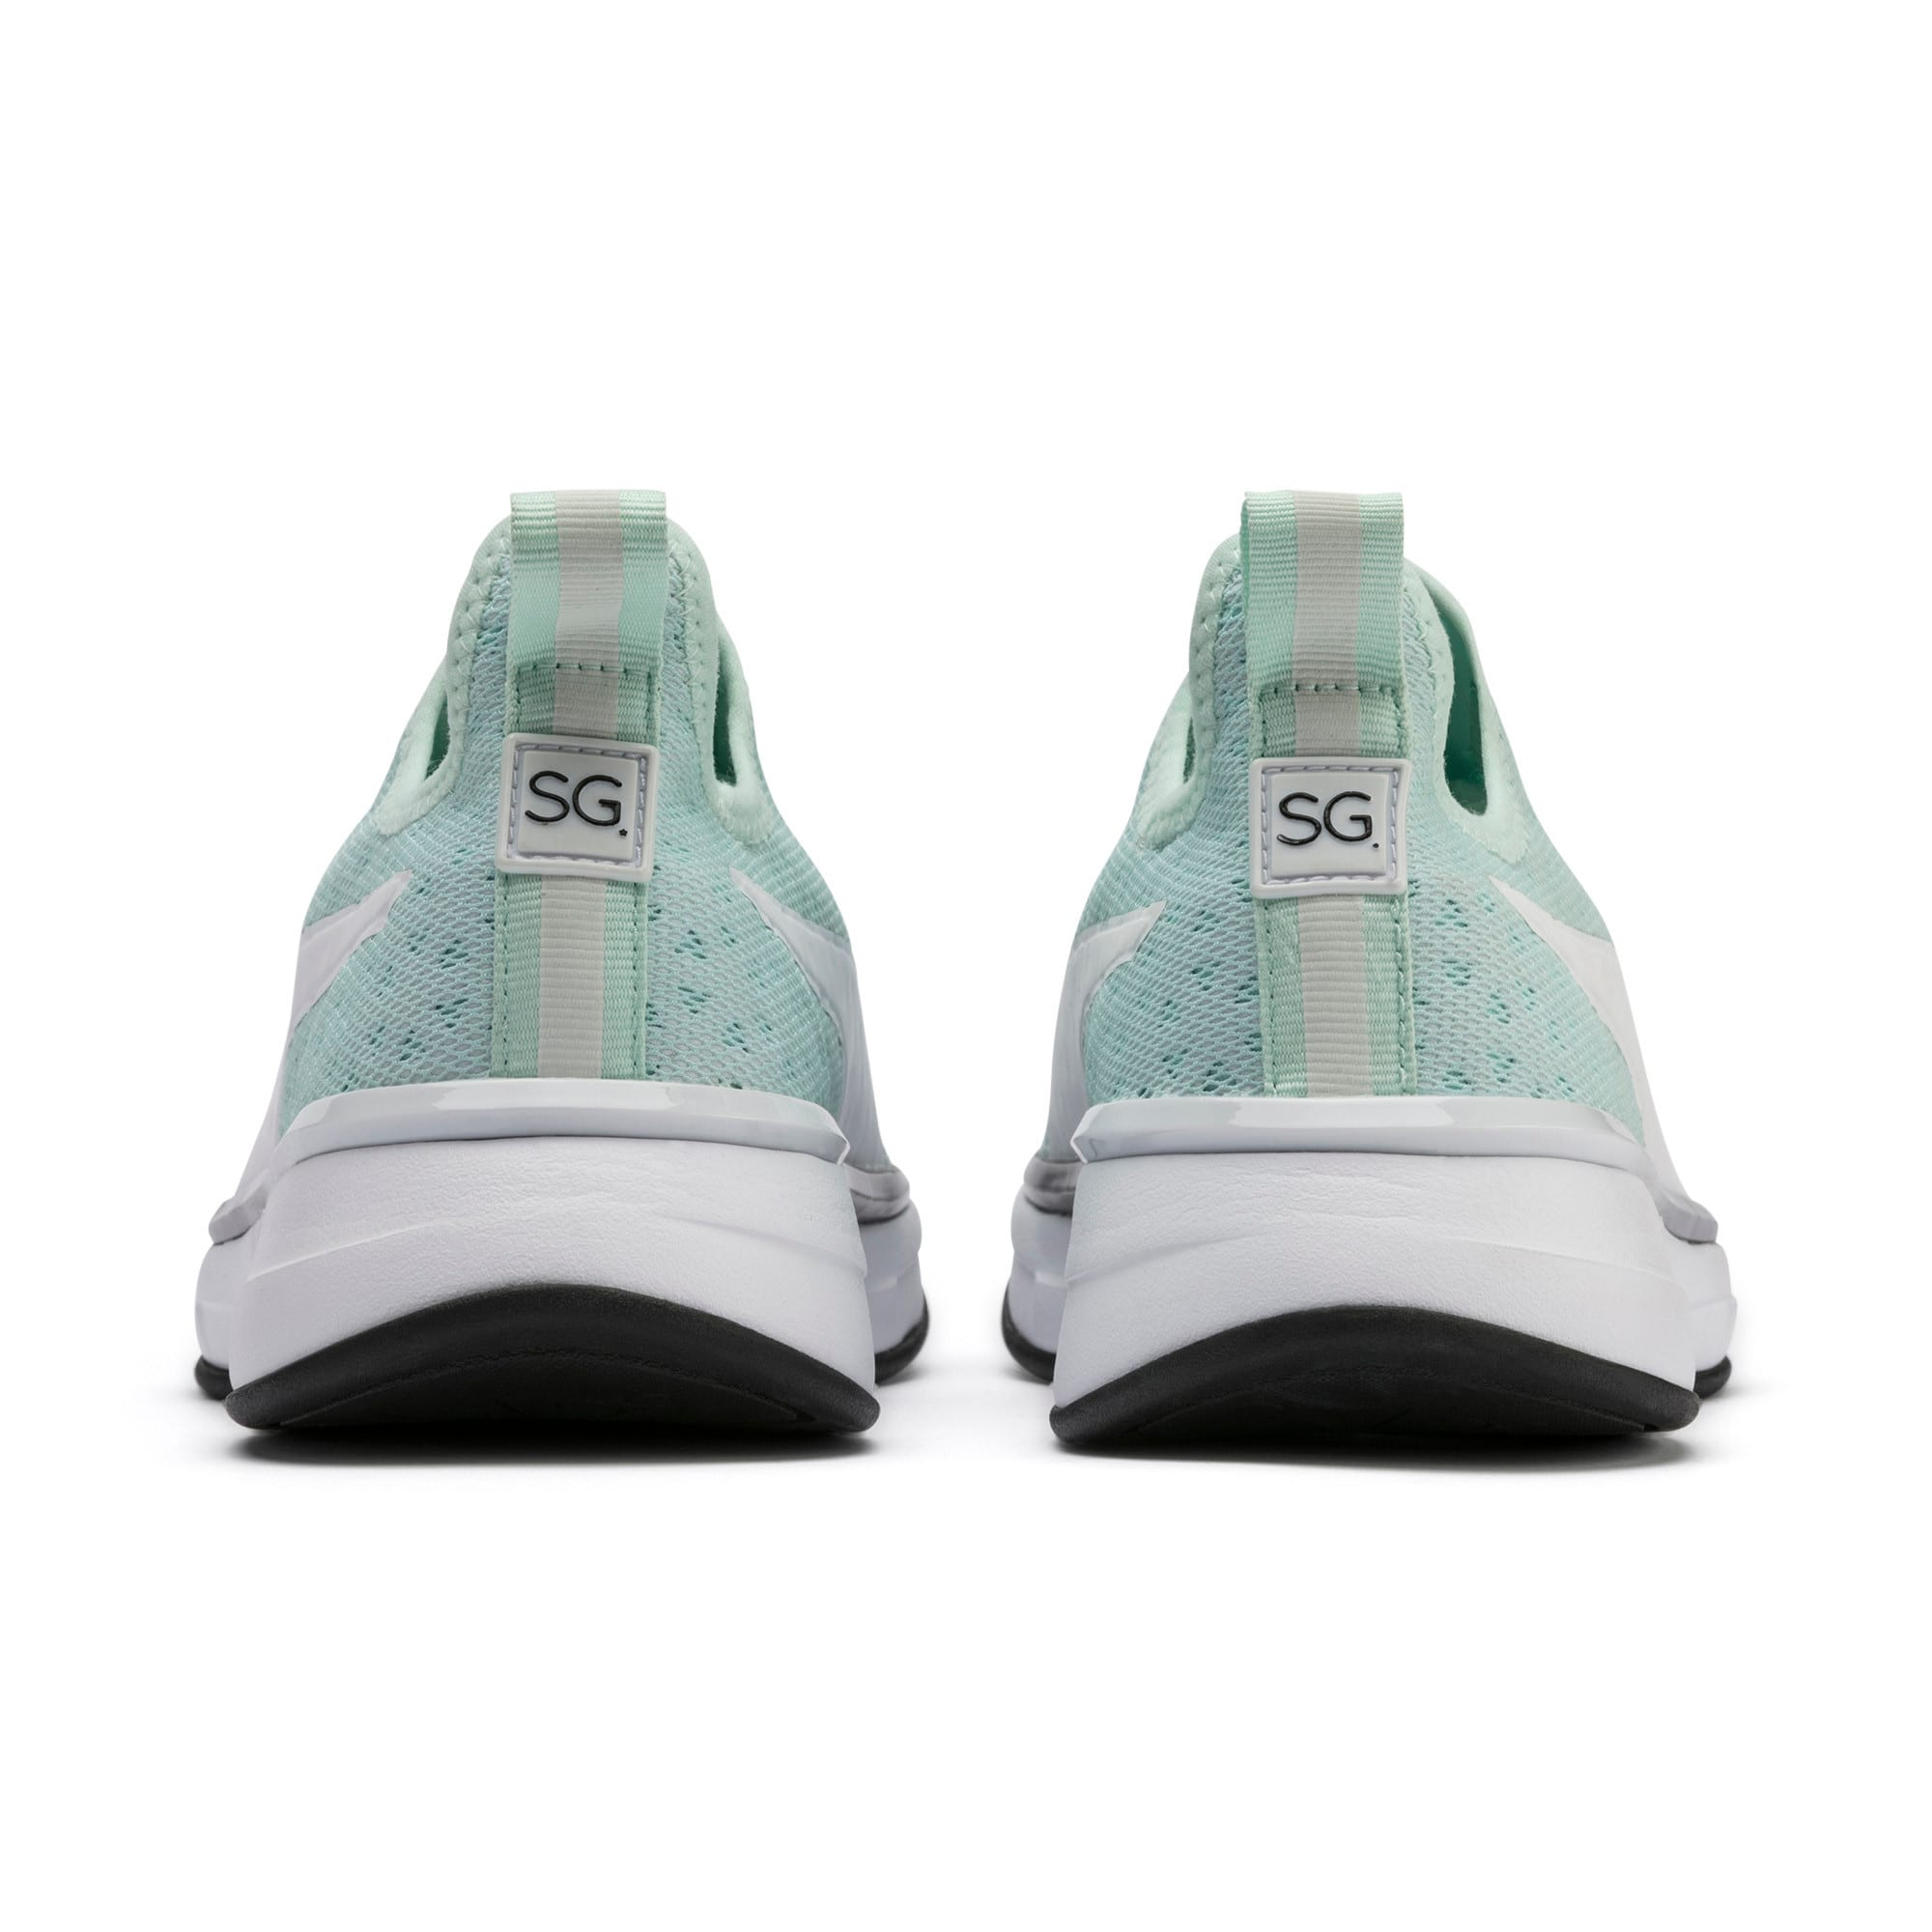 Thumbnail 4 of SG Slip-on Bright Fade Women's Training Shoes, Fair Aqua-Puma Black, medium